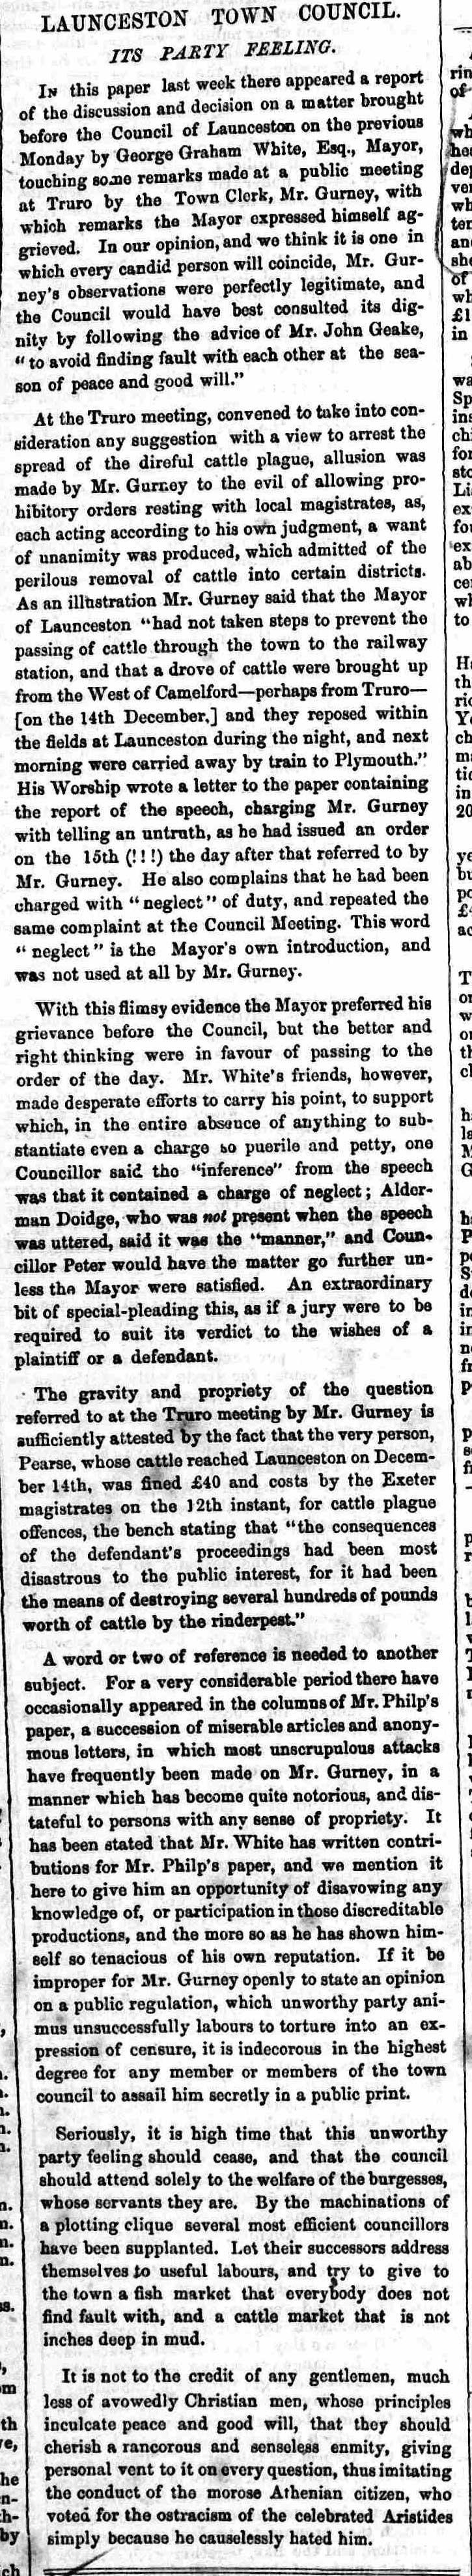 20 January 1866